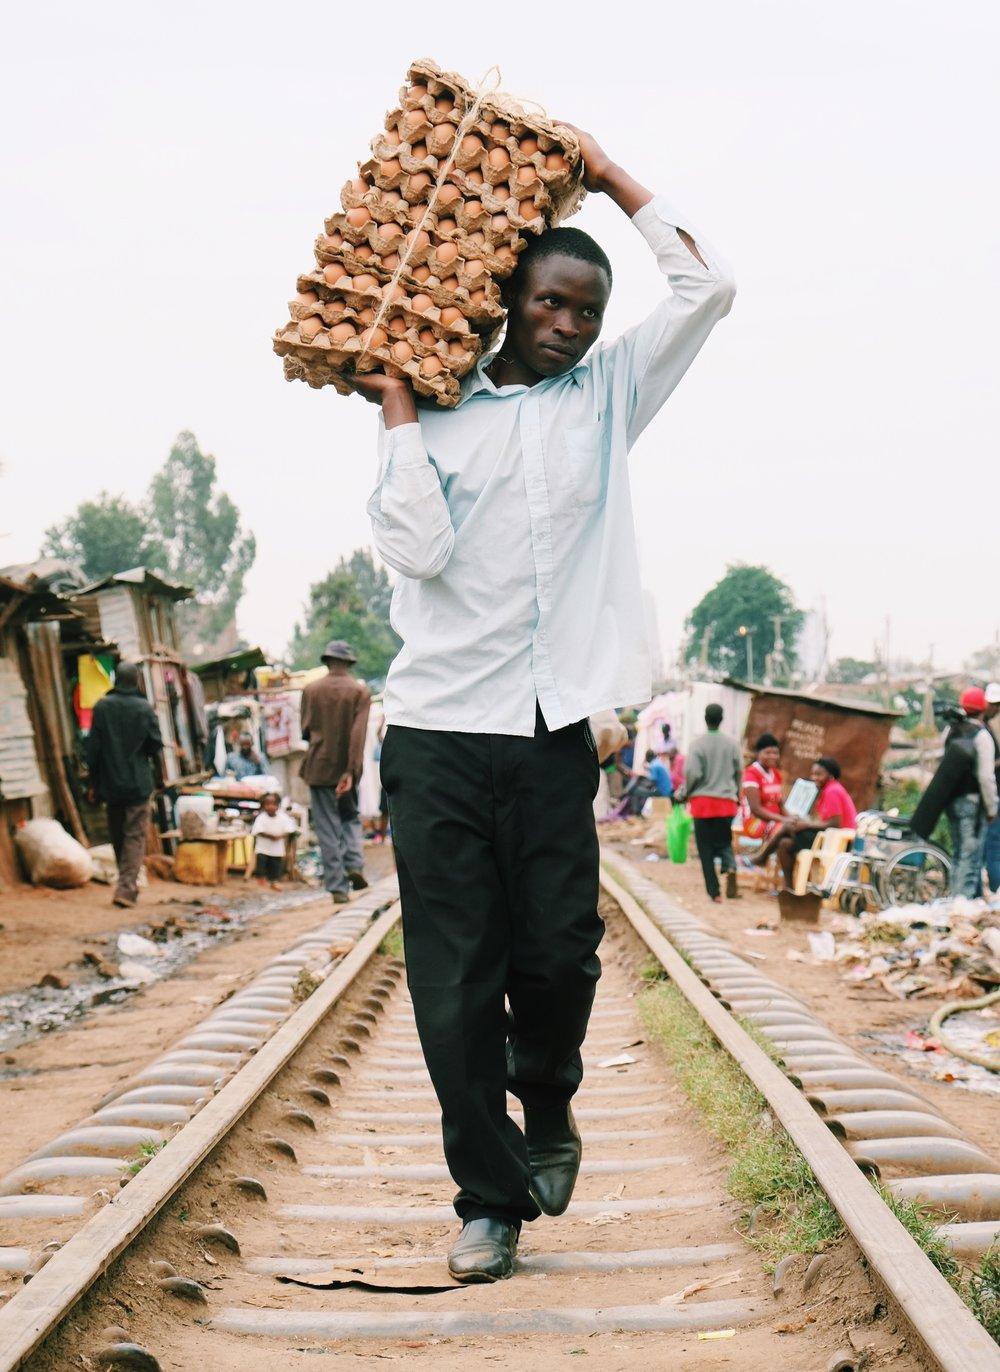 Eggs in Kibera slum, Nairobi Kenya by Joost Bastmeijer.jpeg